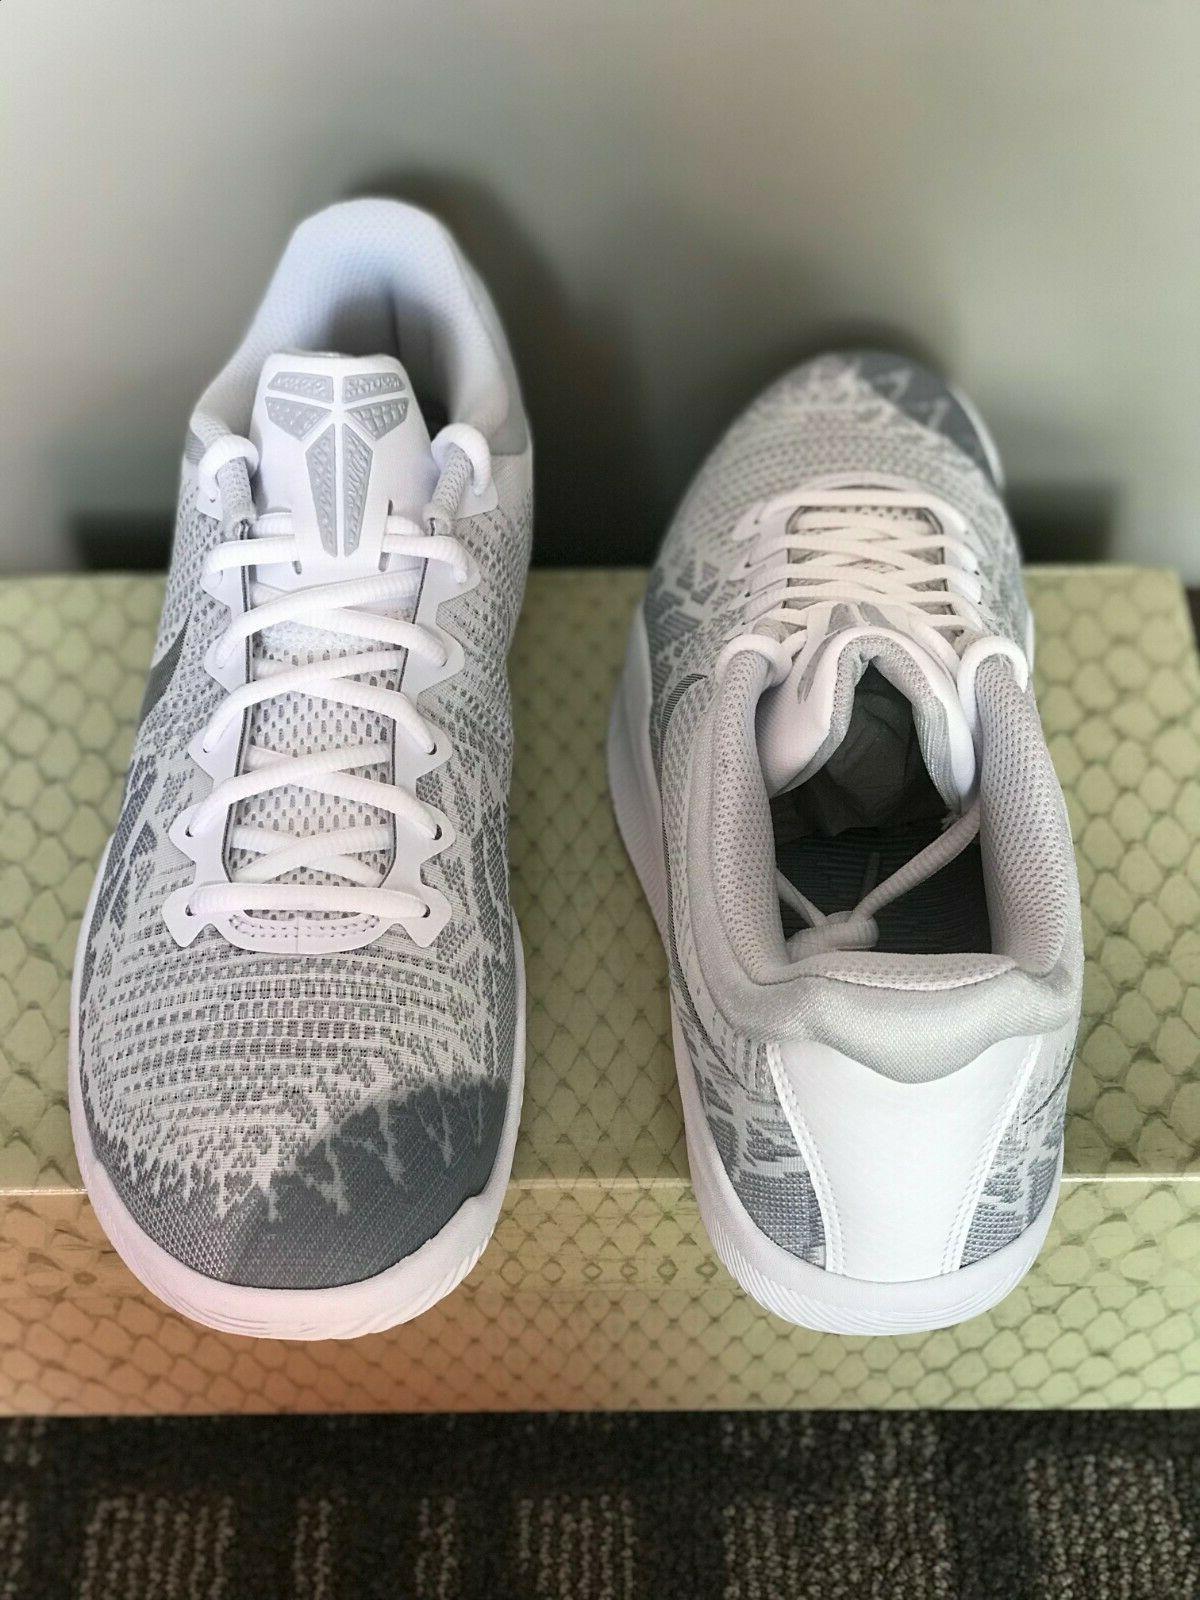 New Nike Kobe Mamba Rage Basketball Low 100 XI Elite